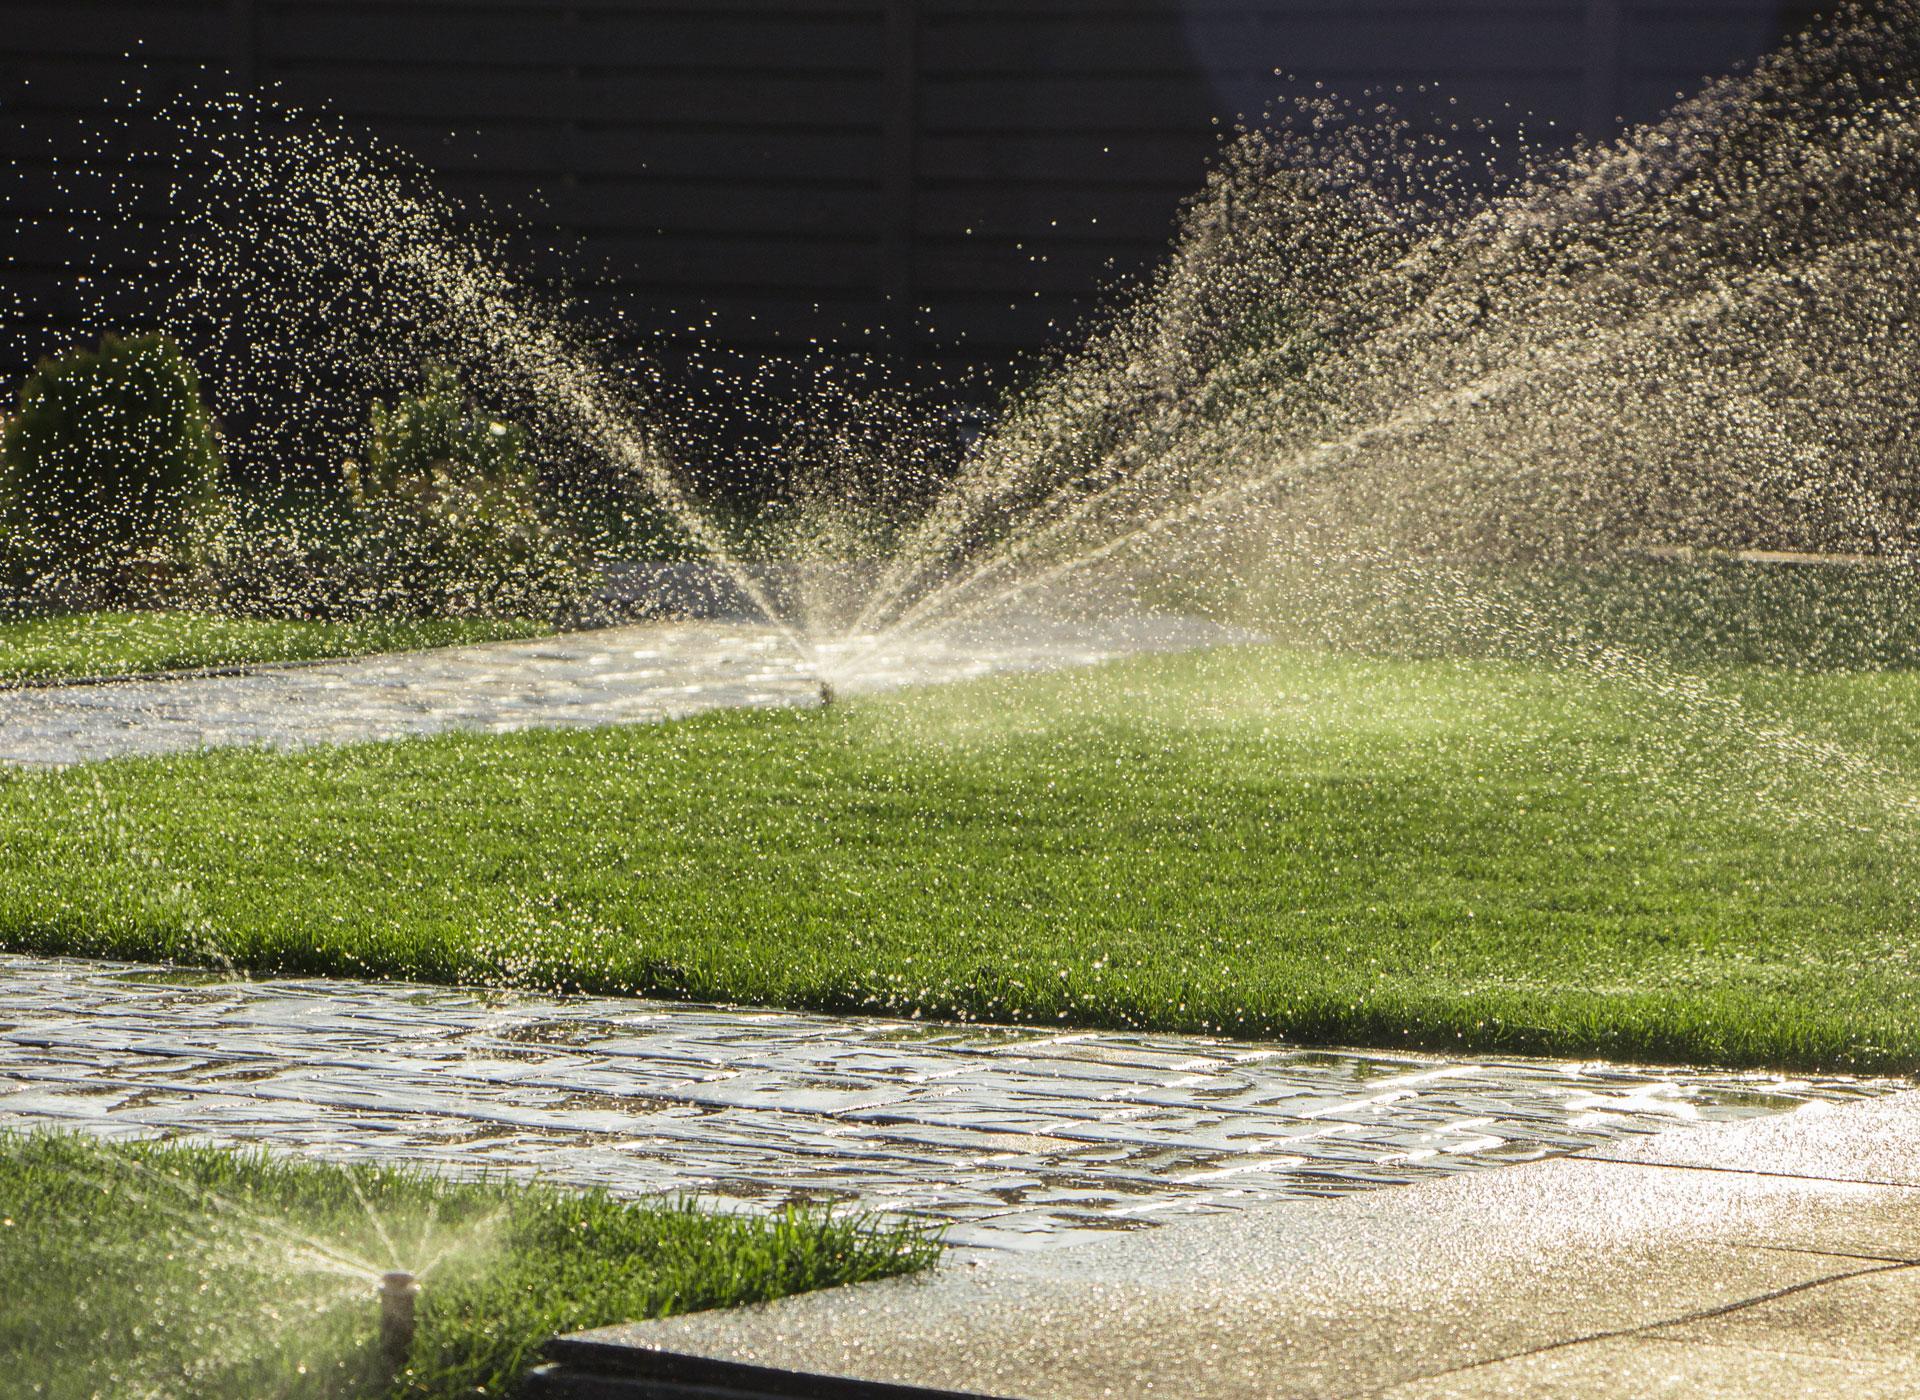 http://www.landwisehort.com/wp-content/uploads/2021/01/Irrigation-Masonry-Grid2.jpg